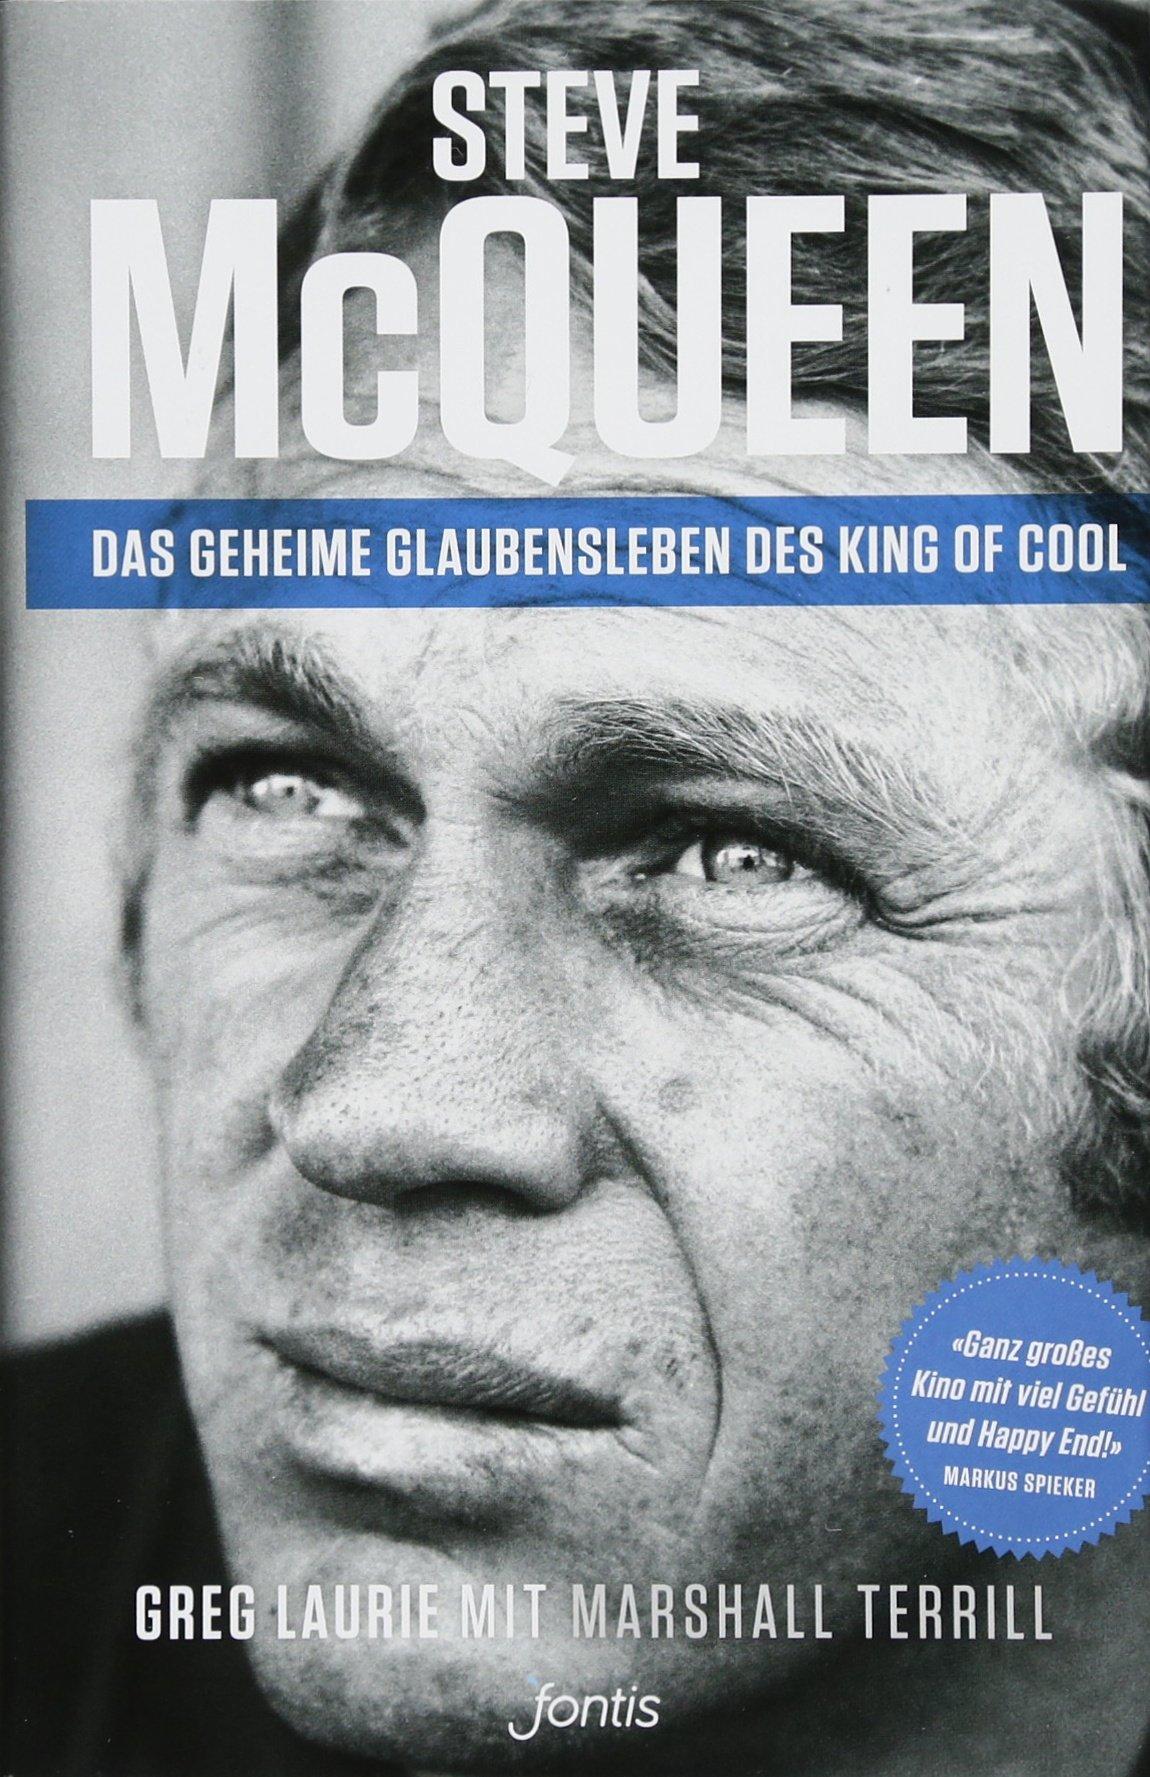 Steve McQueen – Das geheime Glaubensleben des King of Cool: The Salvation of an American Icon